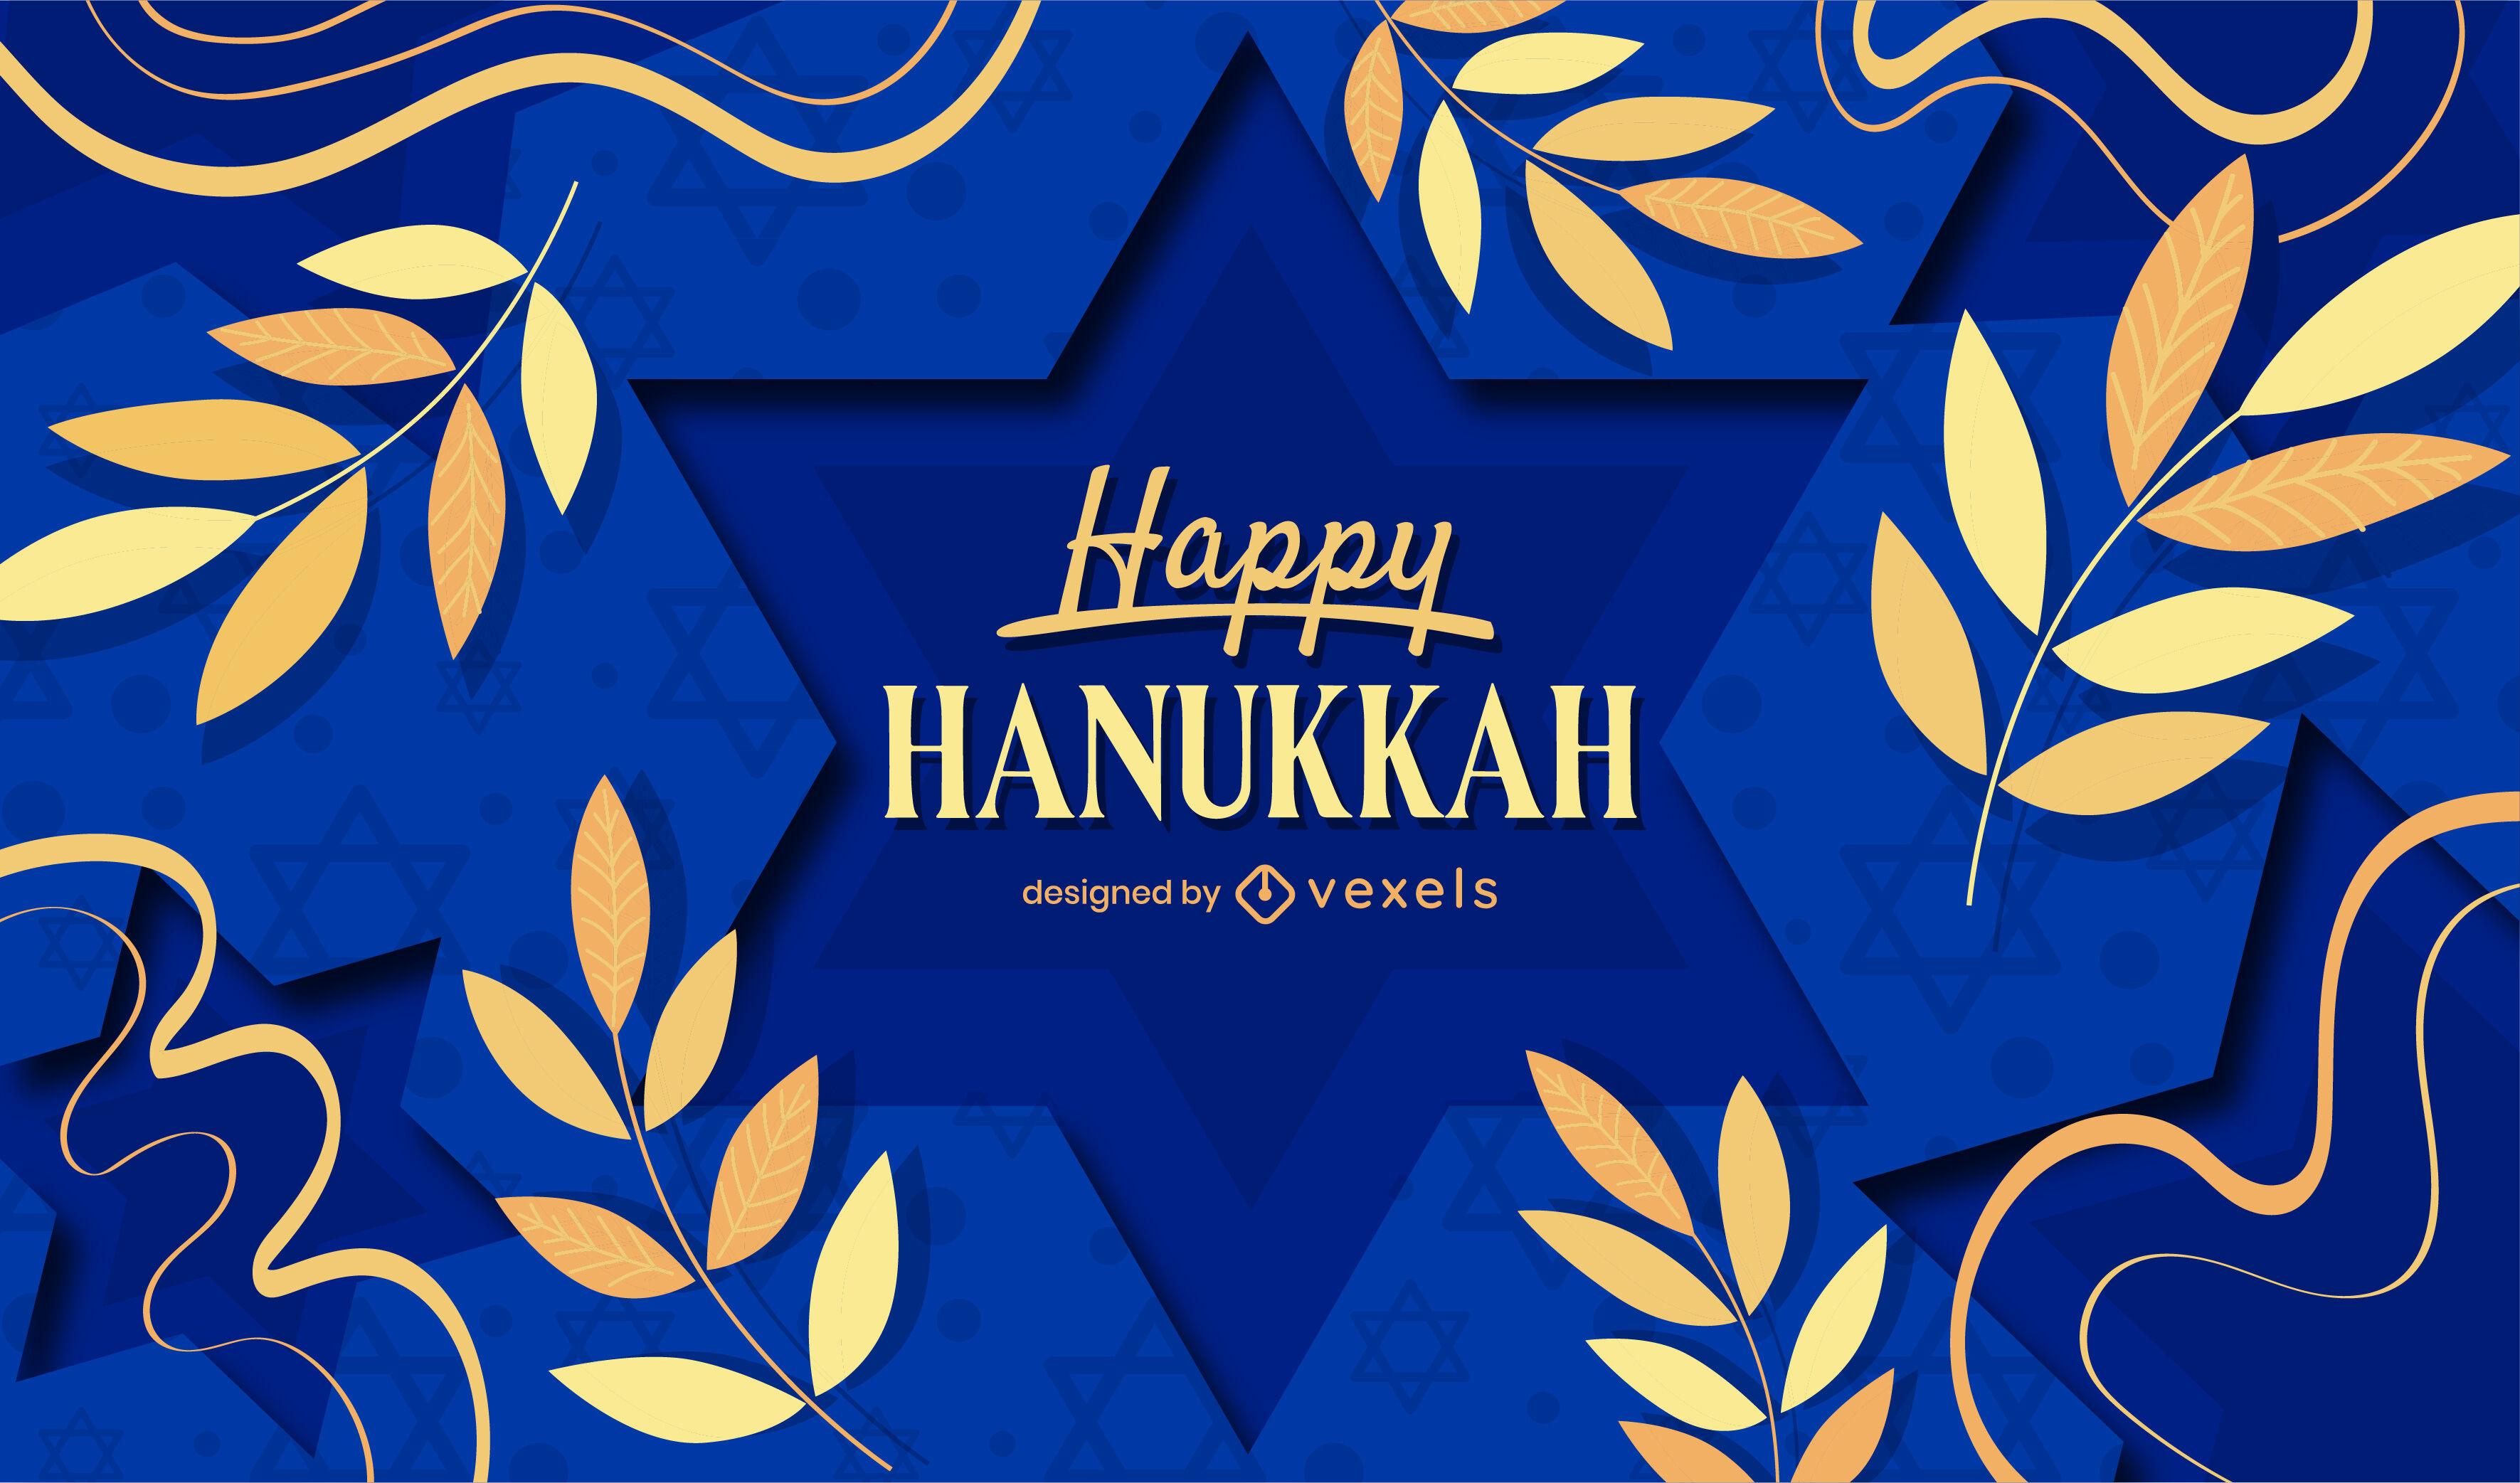 Happy hanukkah background papercut